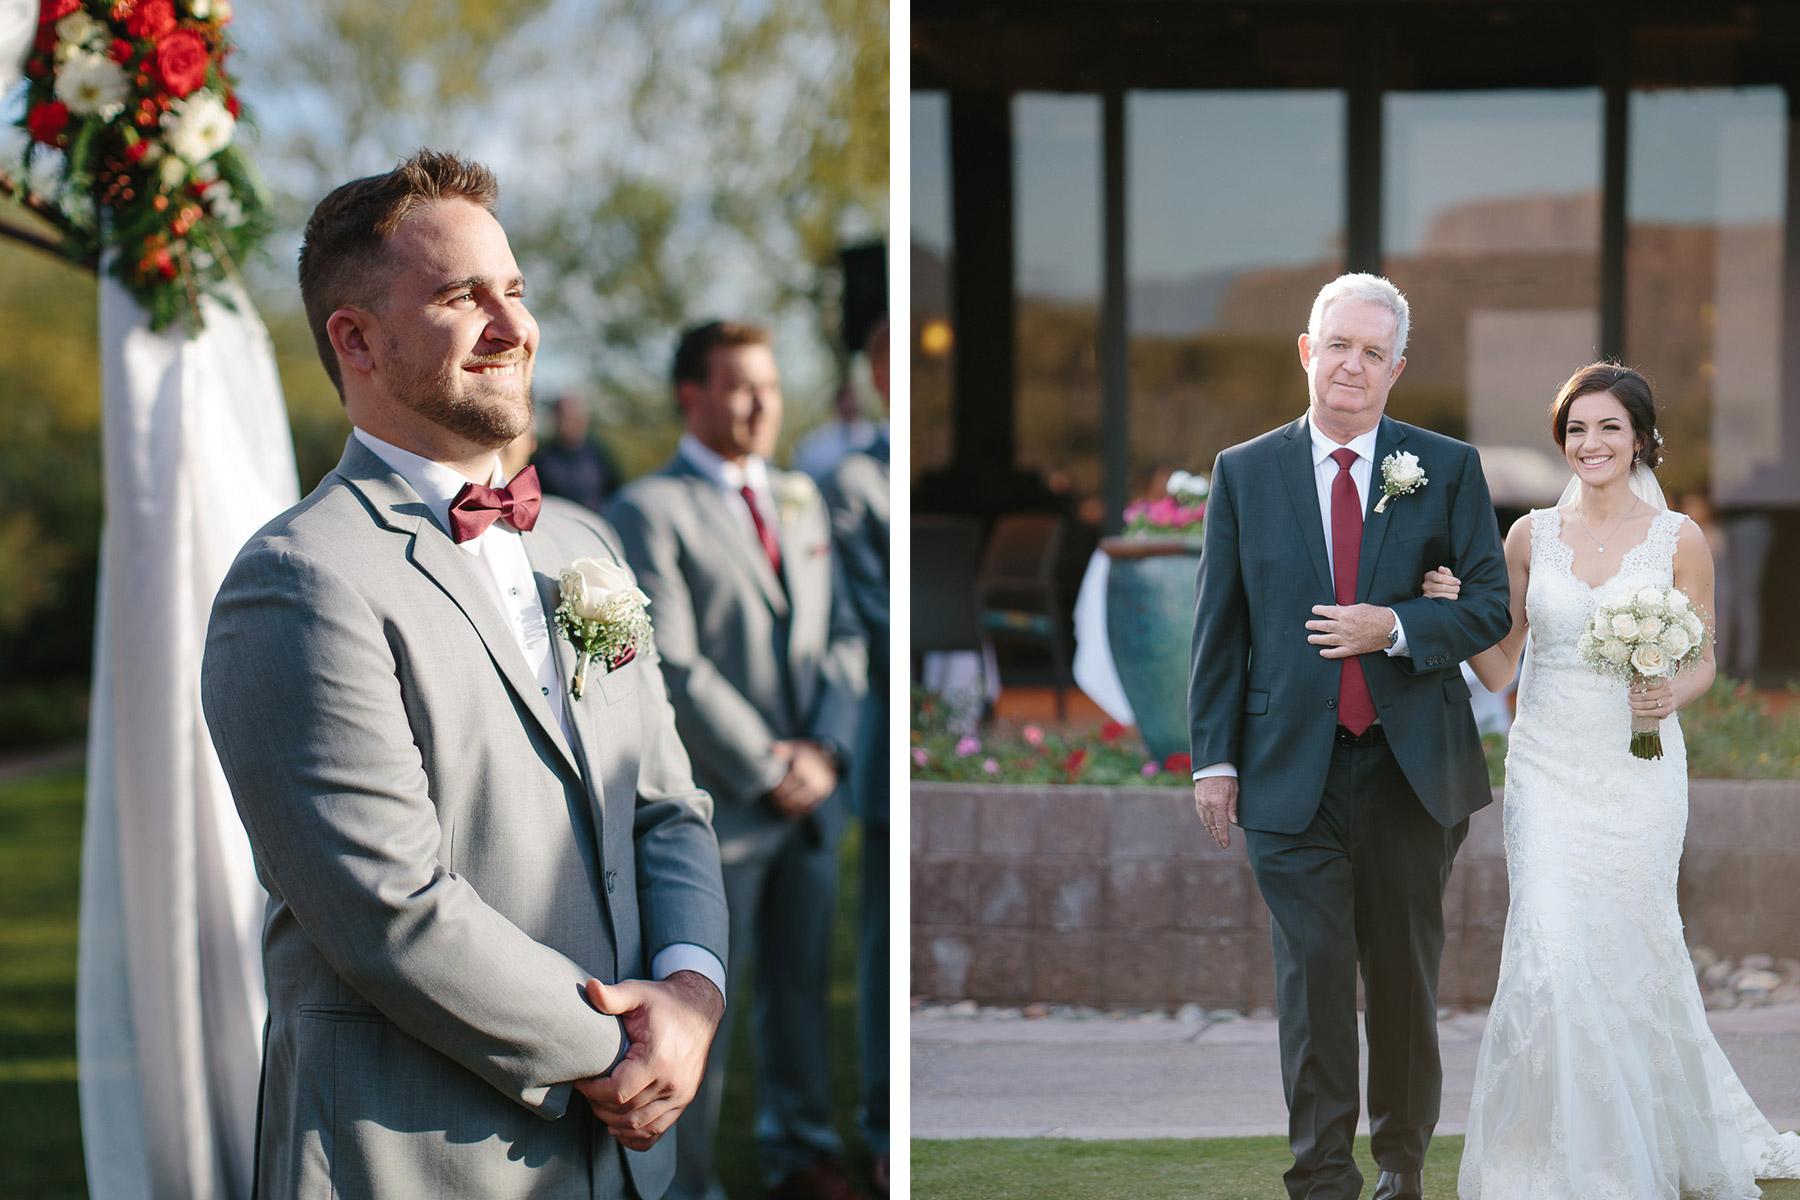 161210-Luxium-Weddings-Arizona-Matt-Jenny-Anthem-Golf-Country-Club-1025a.jpg